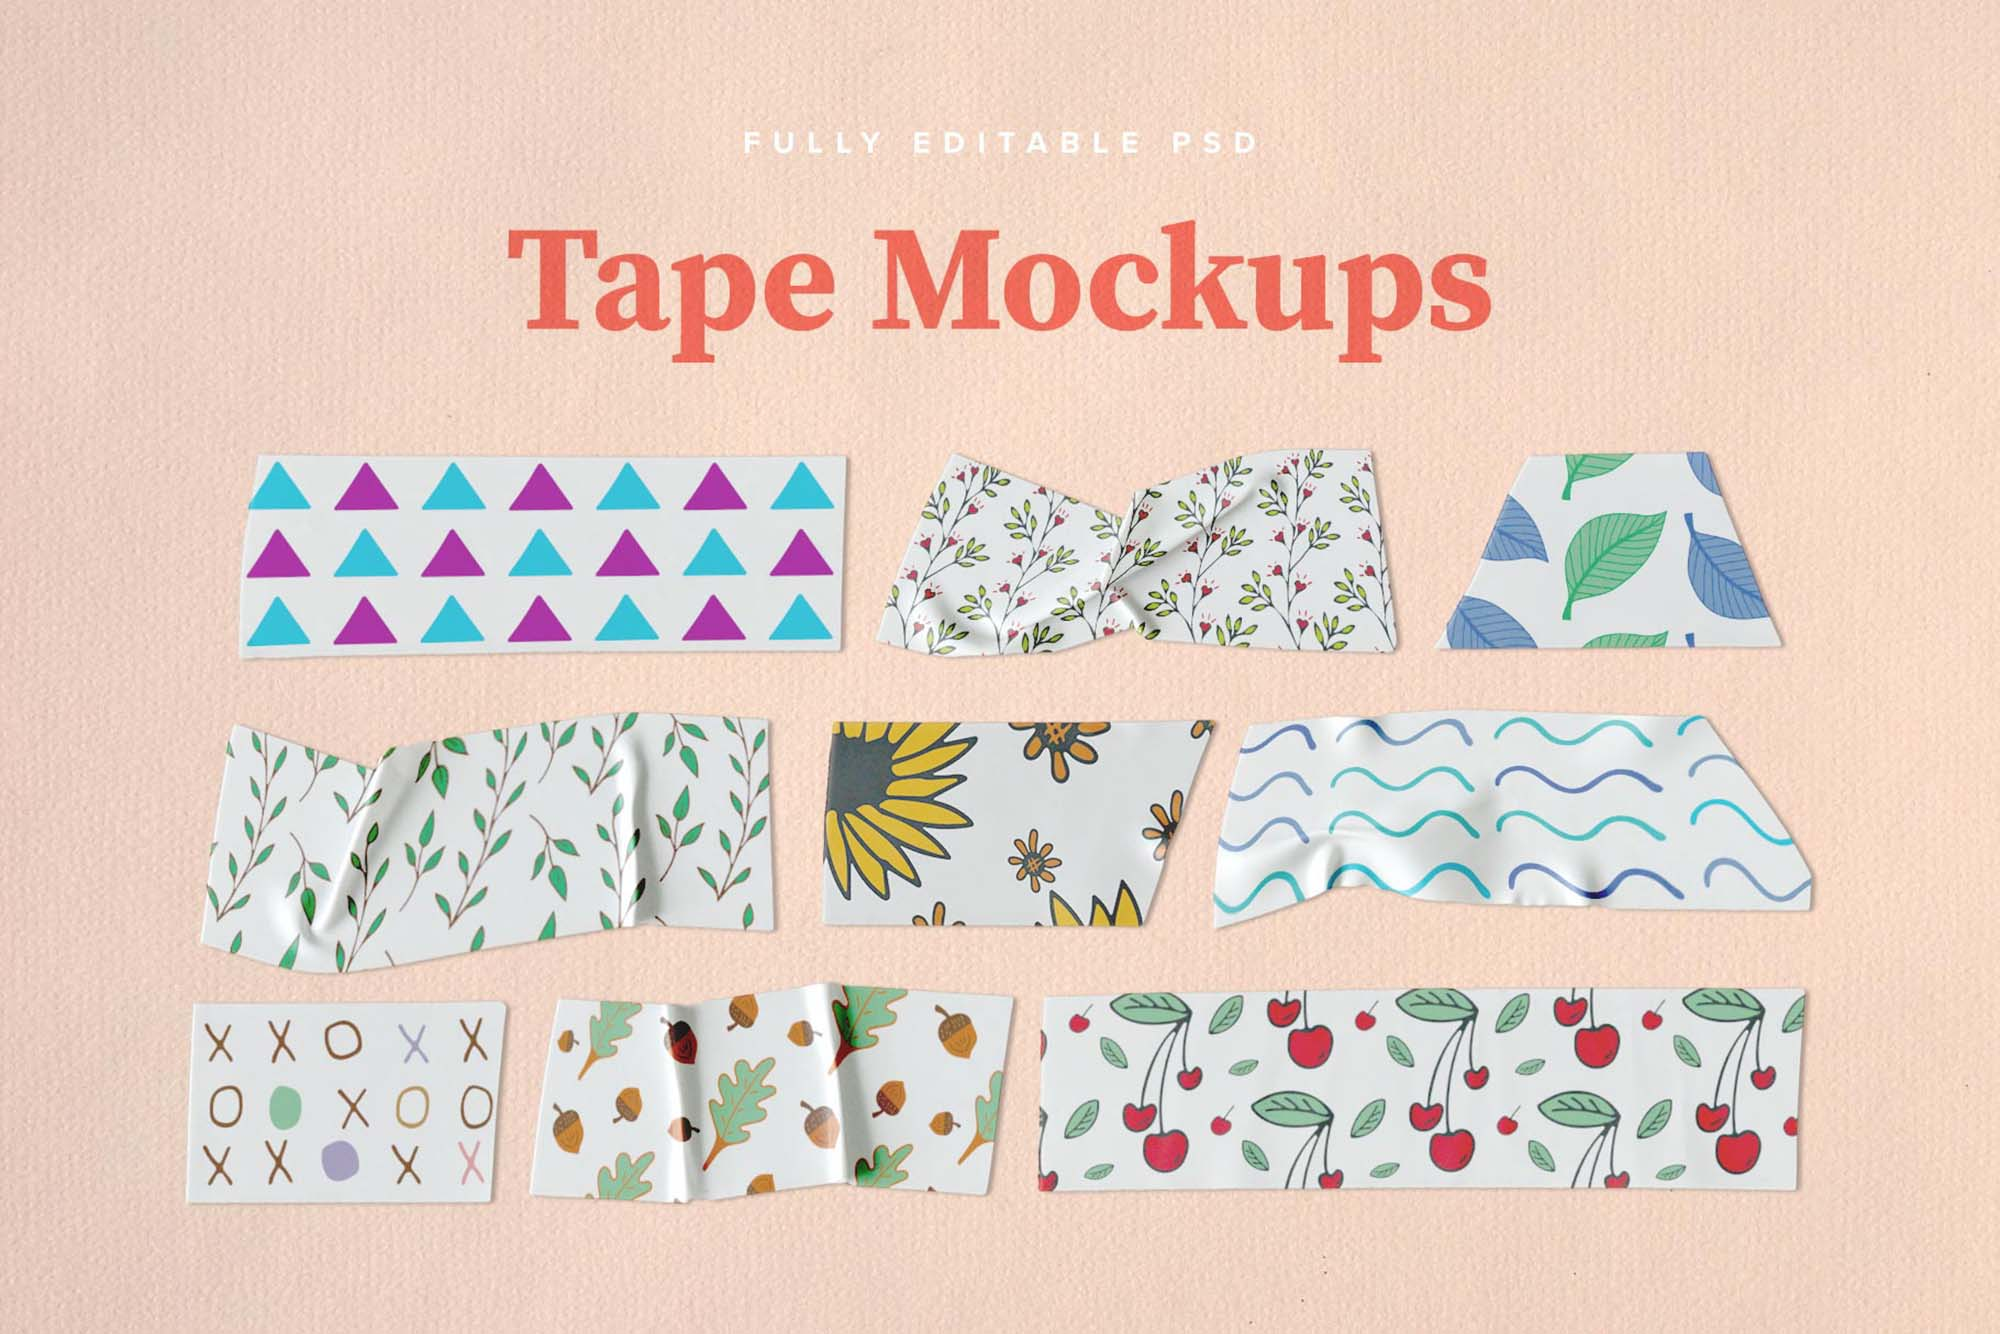 Tape Mockup 2